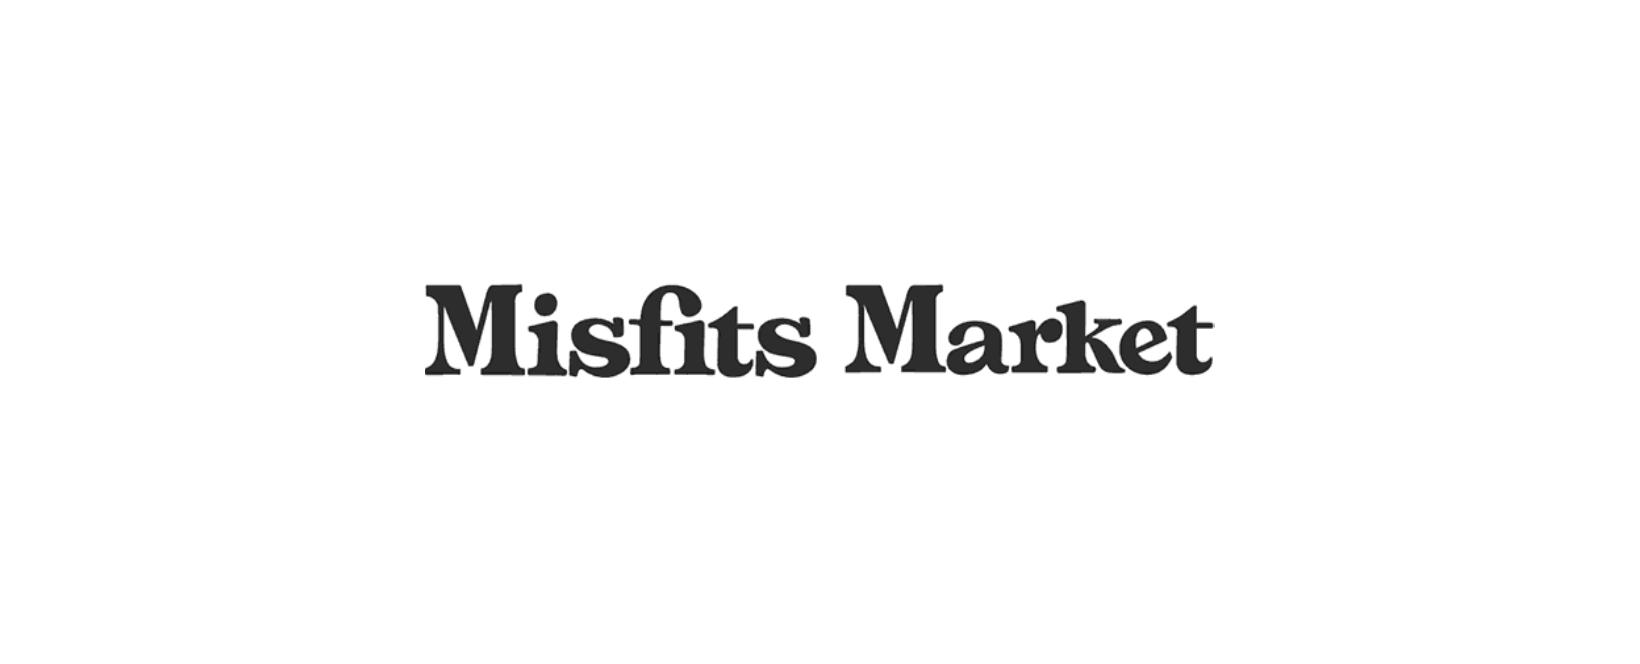 Misfits Market Discount Code 2021